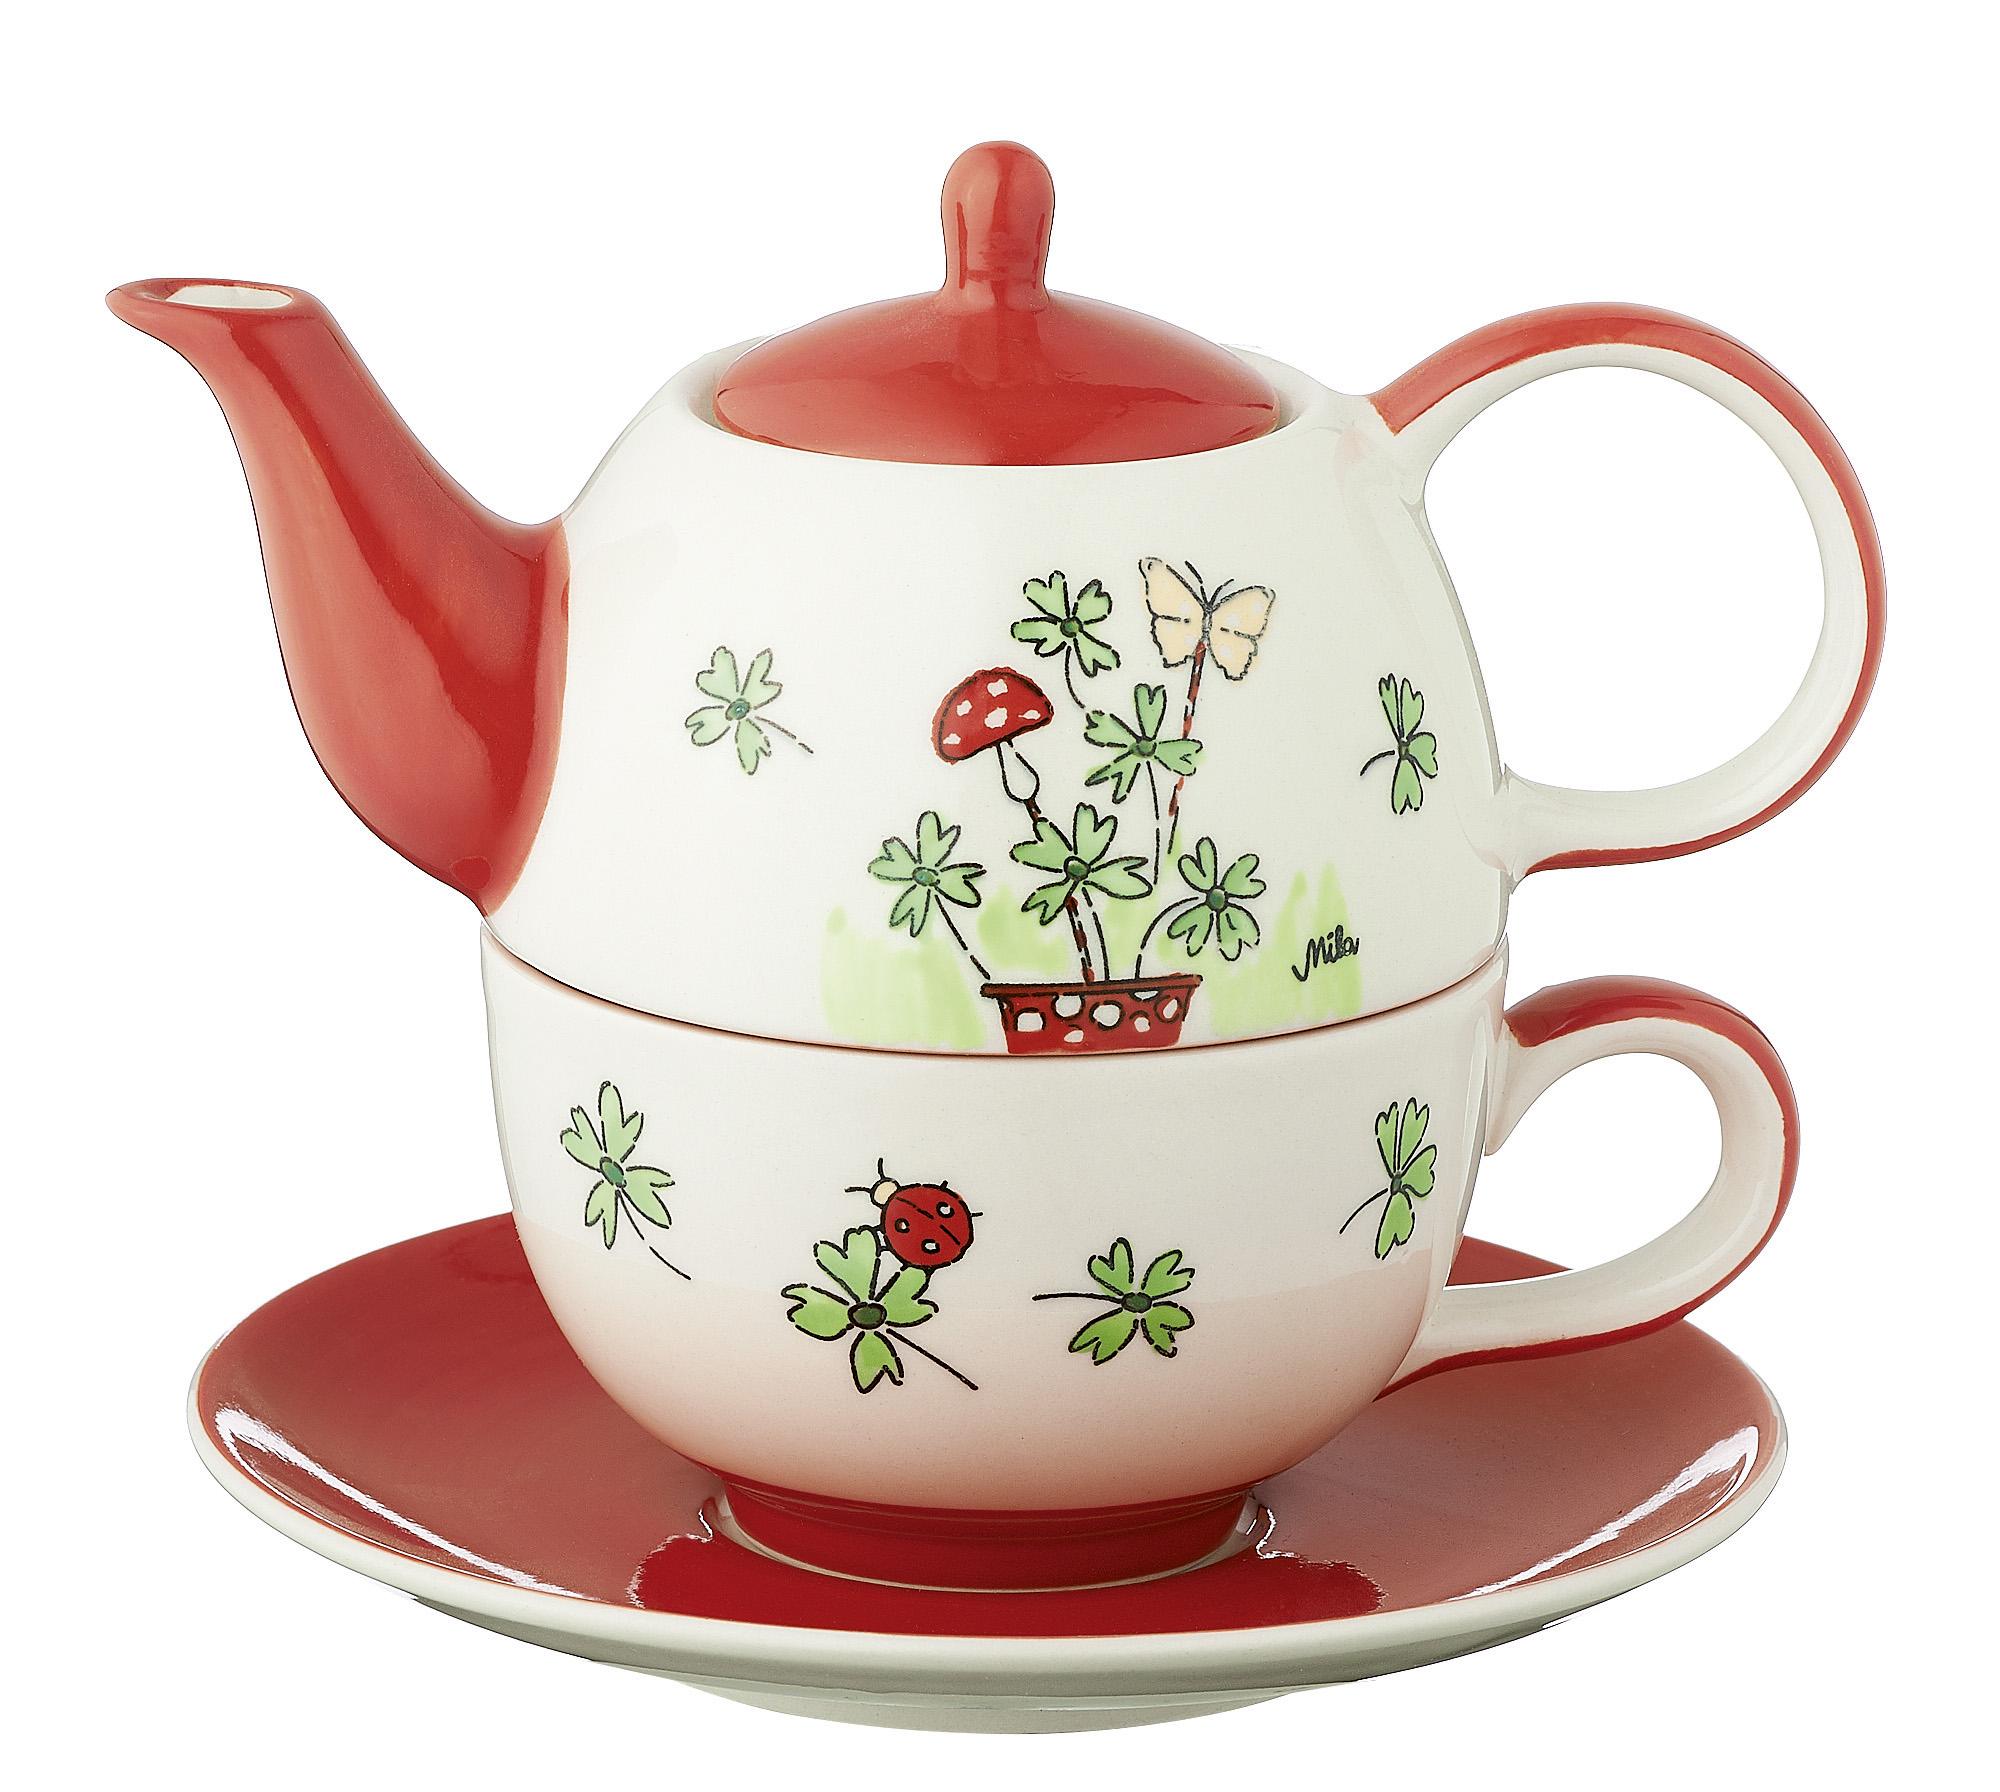 Tea for one - Viel Glück